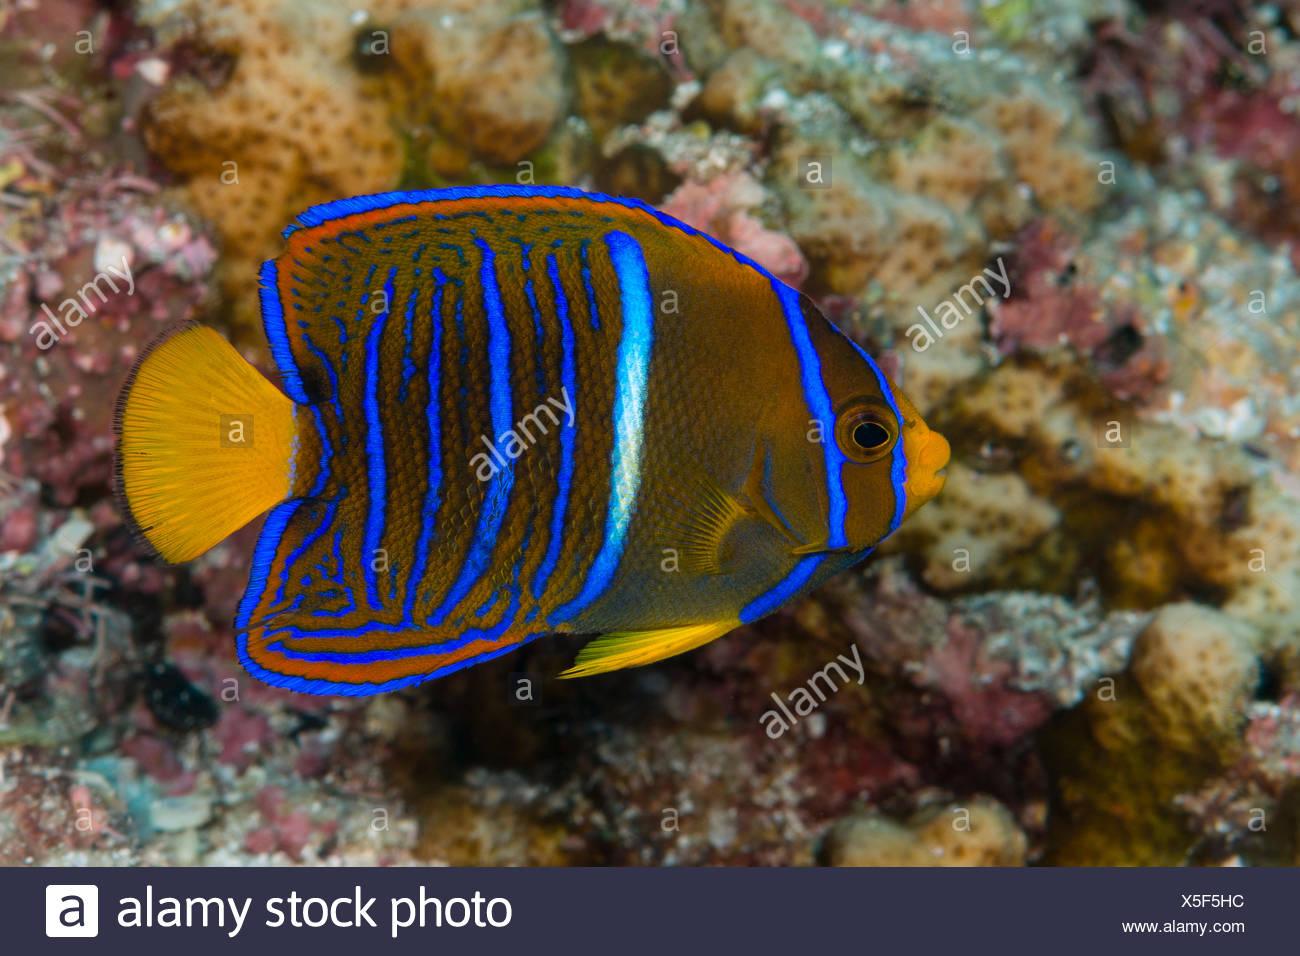 Juvenile King Angelfish, Holacanthus passer, La Paz, Baja California Sur, Mexico - Stock Image